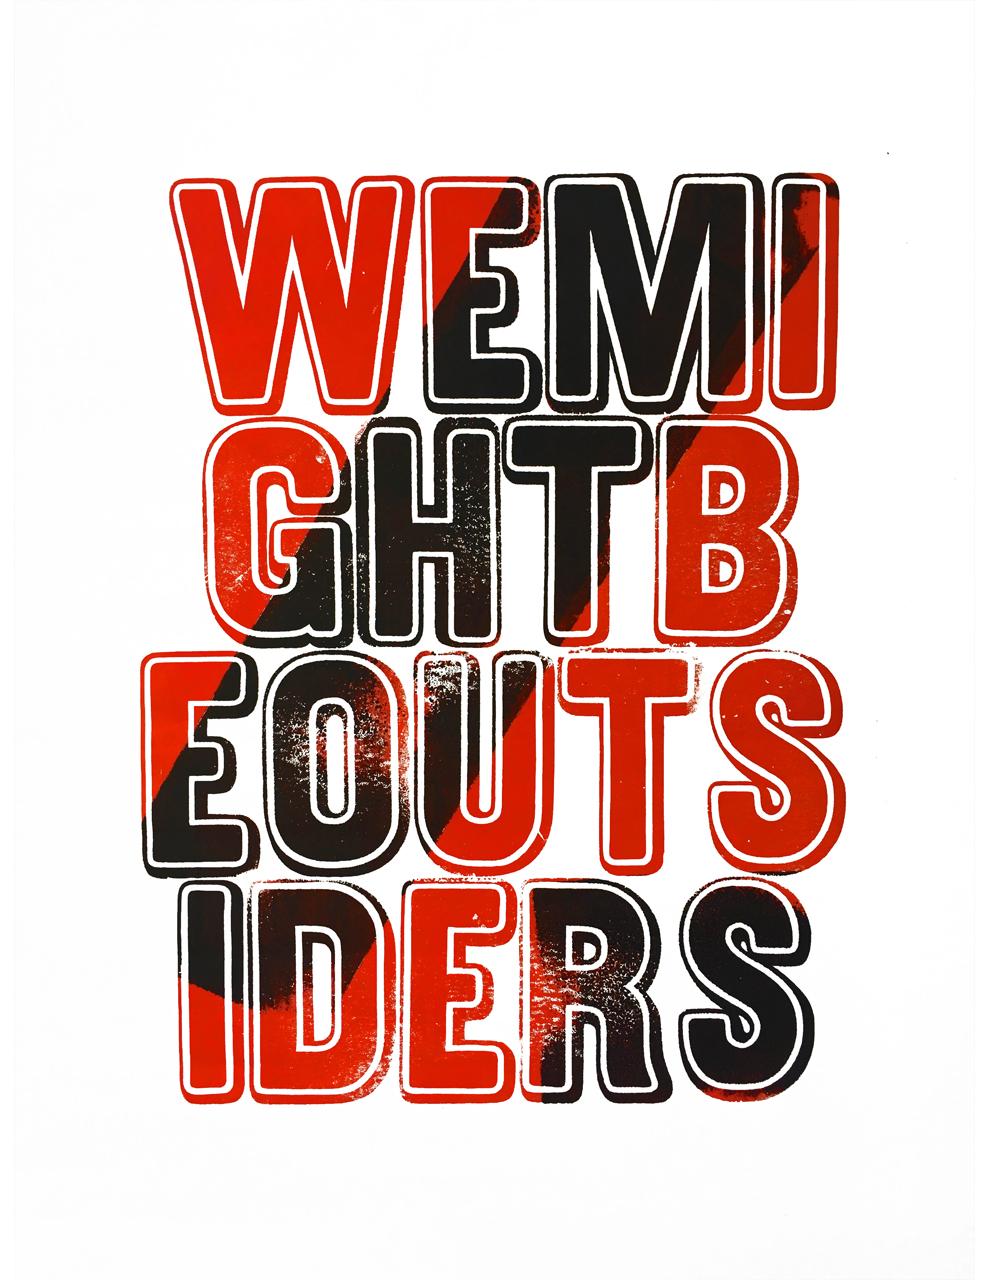 WEMIGHTBEOUTSIDERS